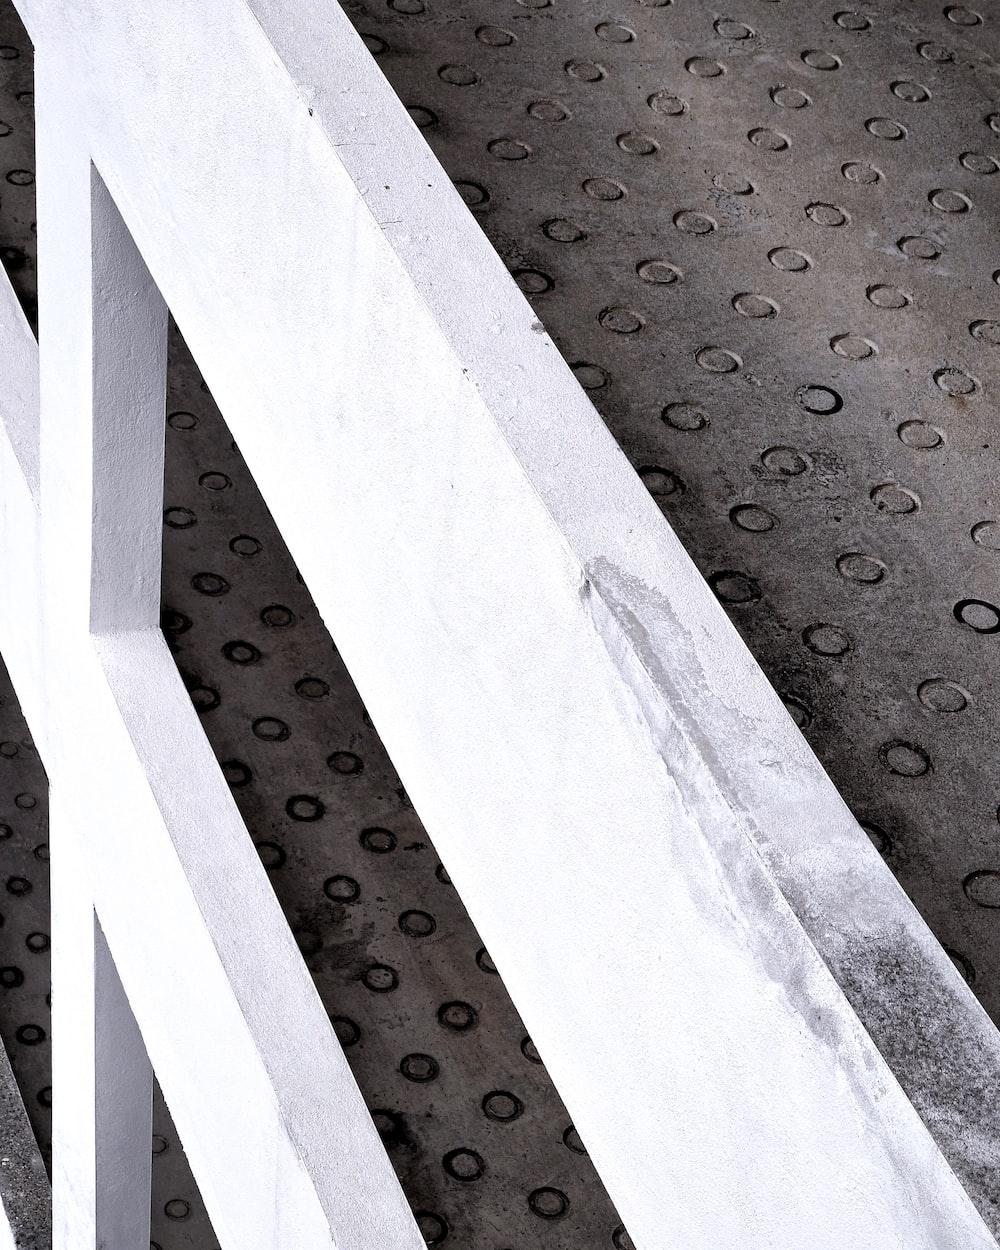 white concrete staircase with black and white polka dot pattern